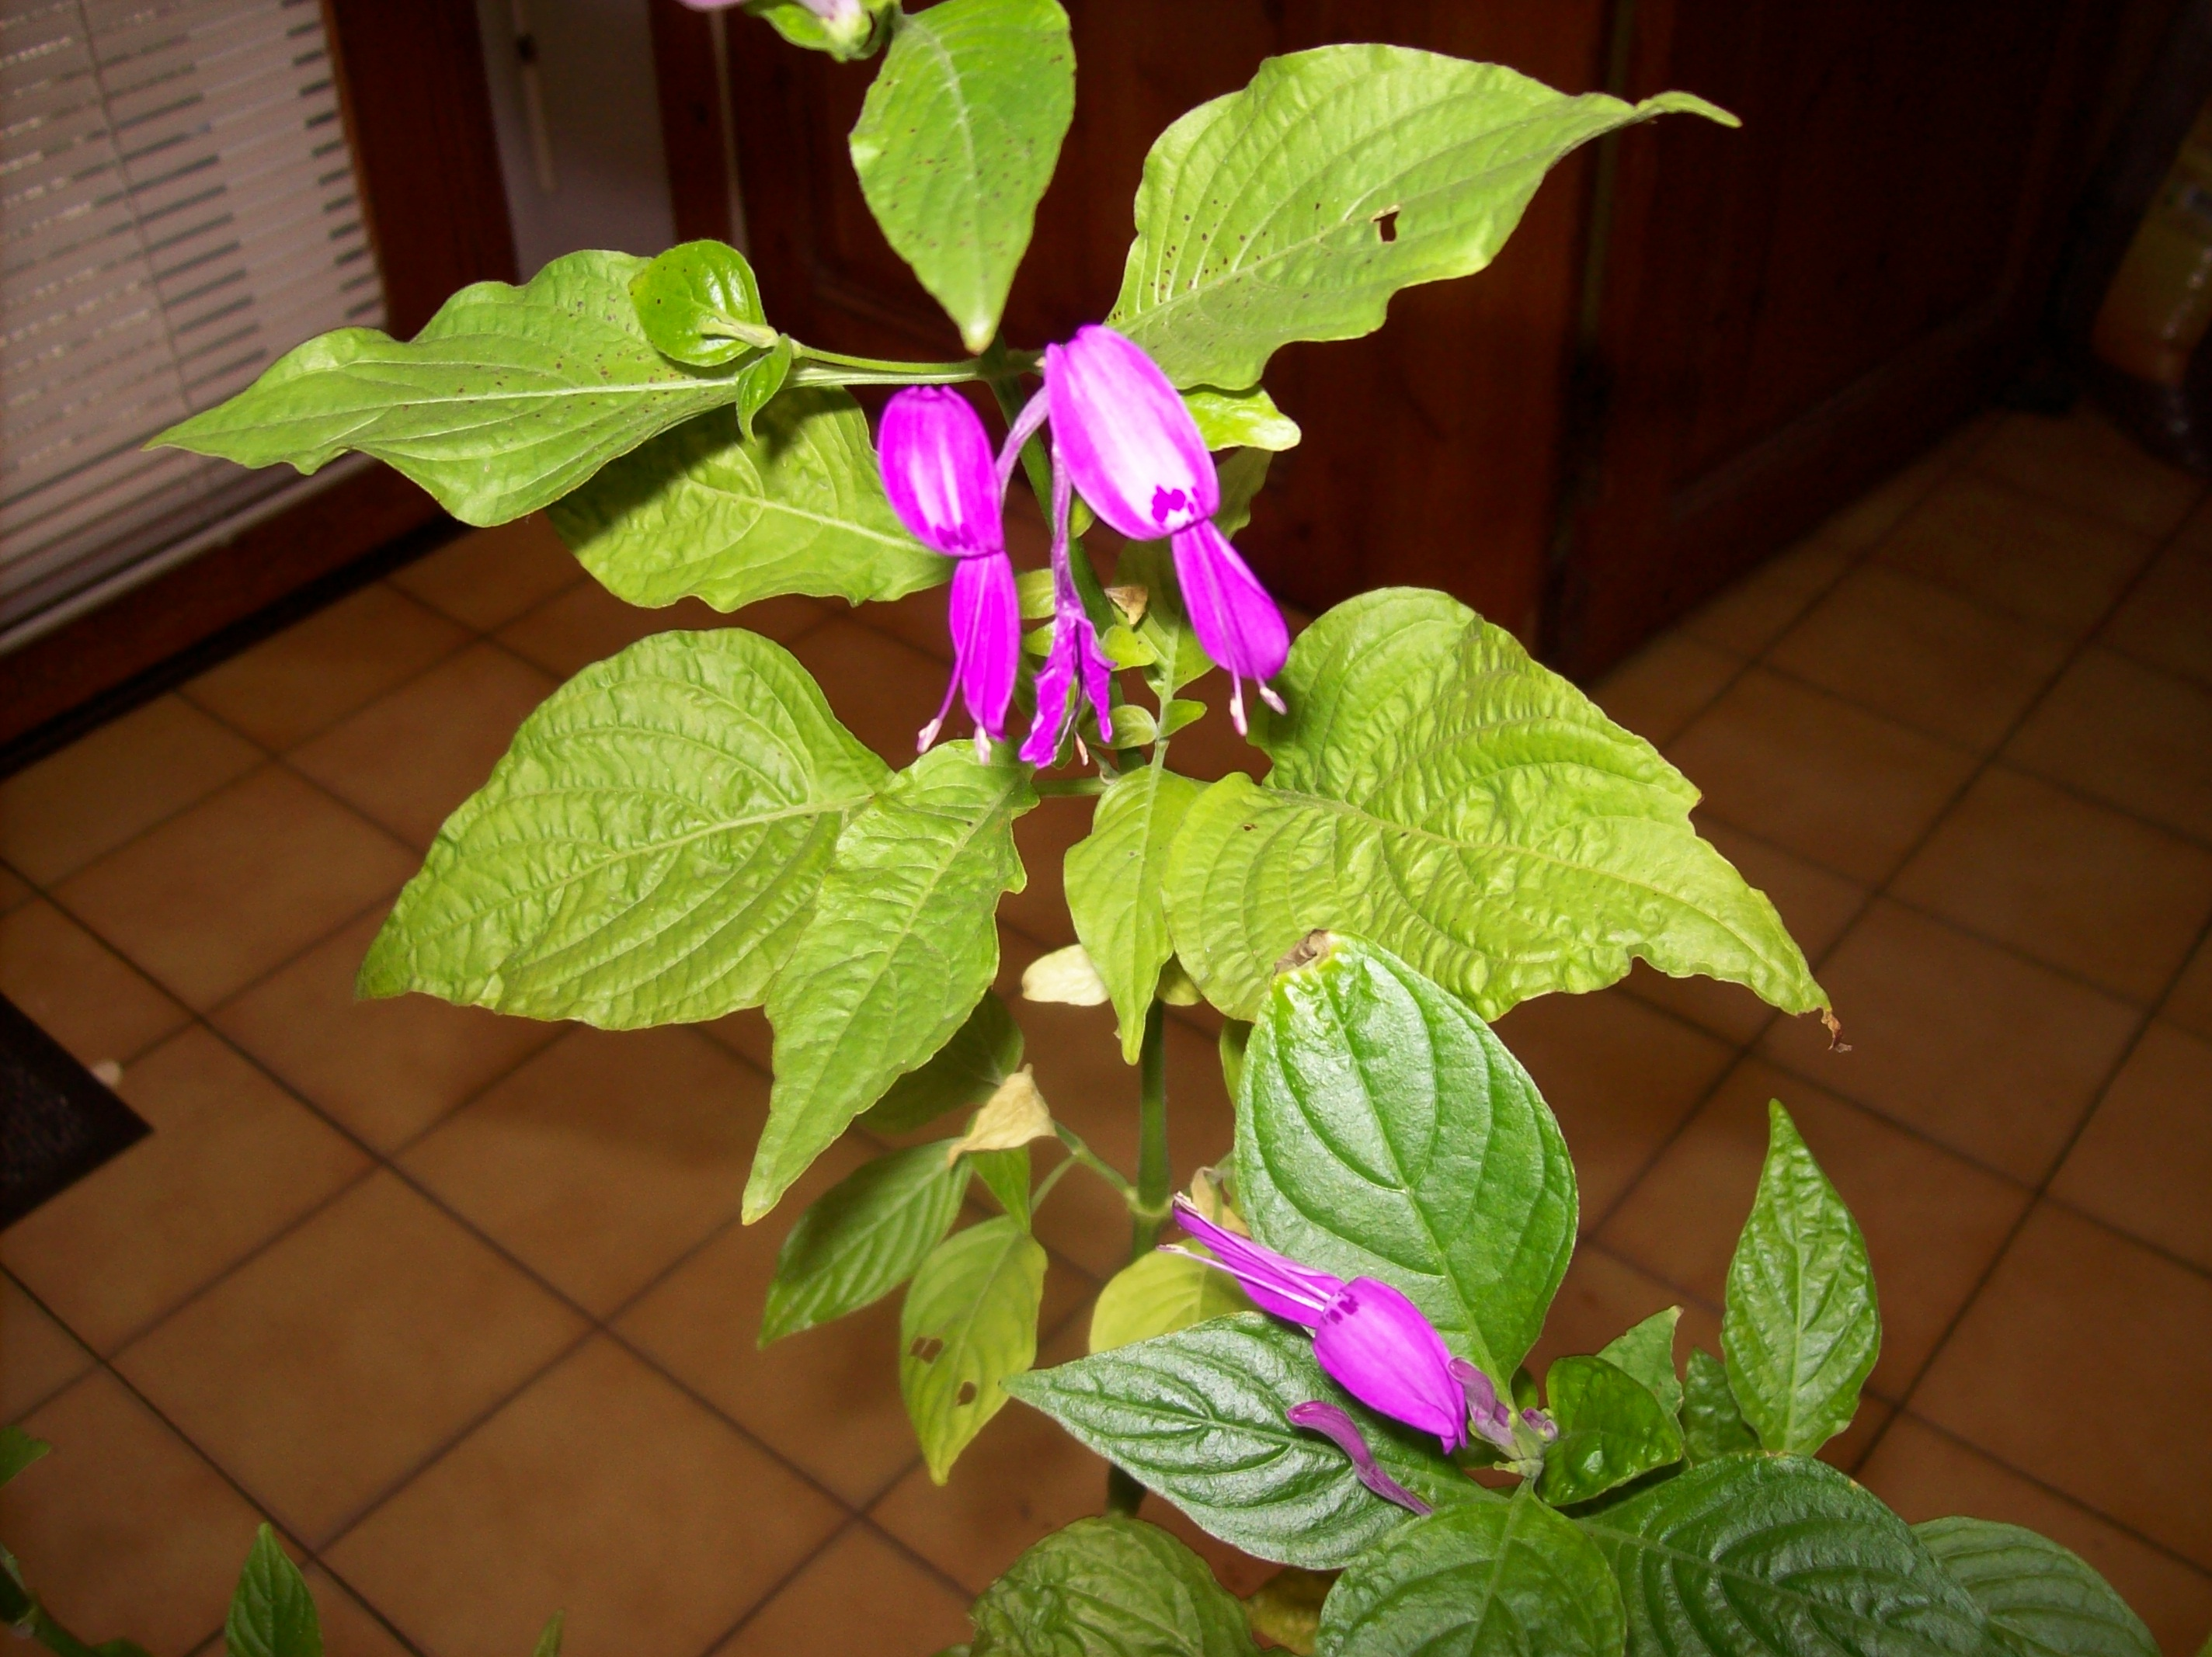 Quelques photos de plantes en fleurs en ce moment 409464peristrophespeciosaJPG